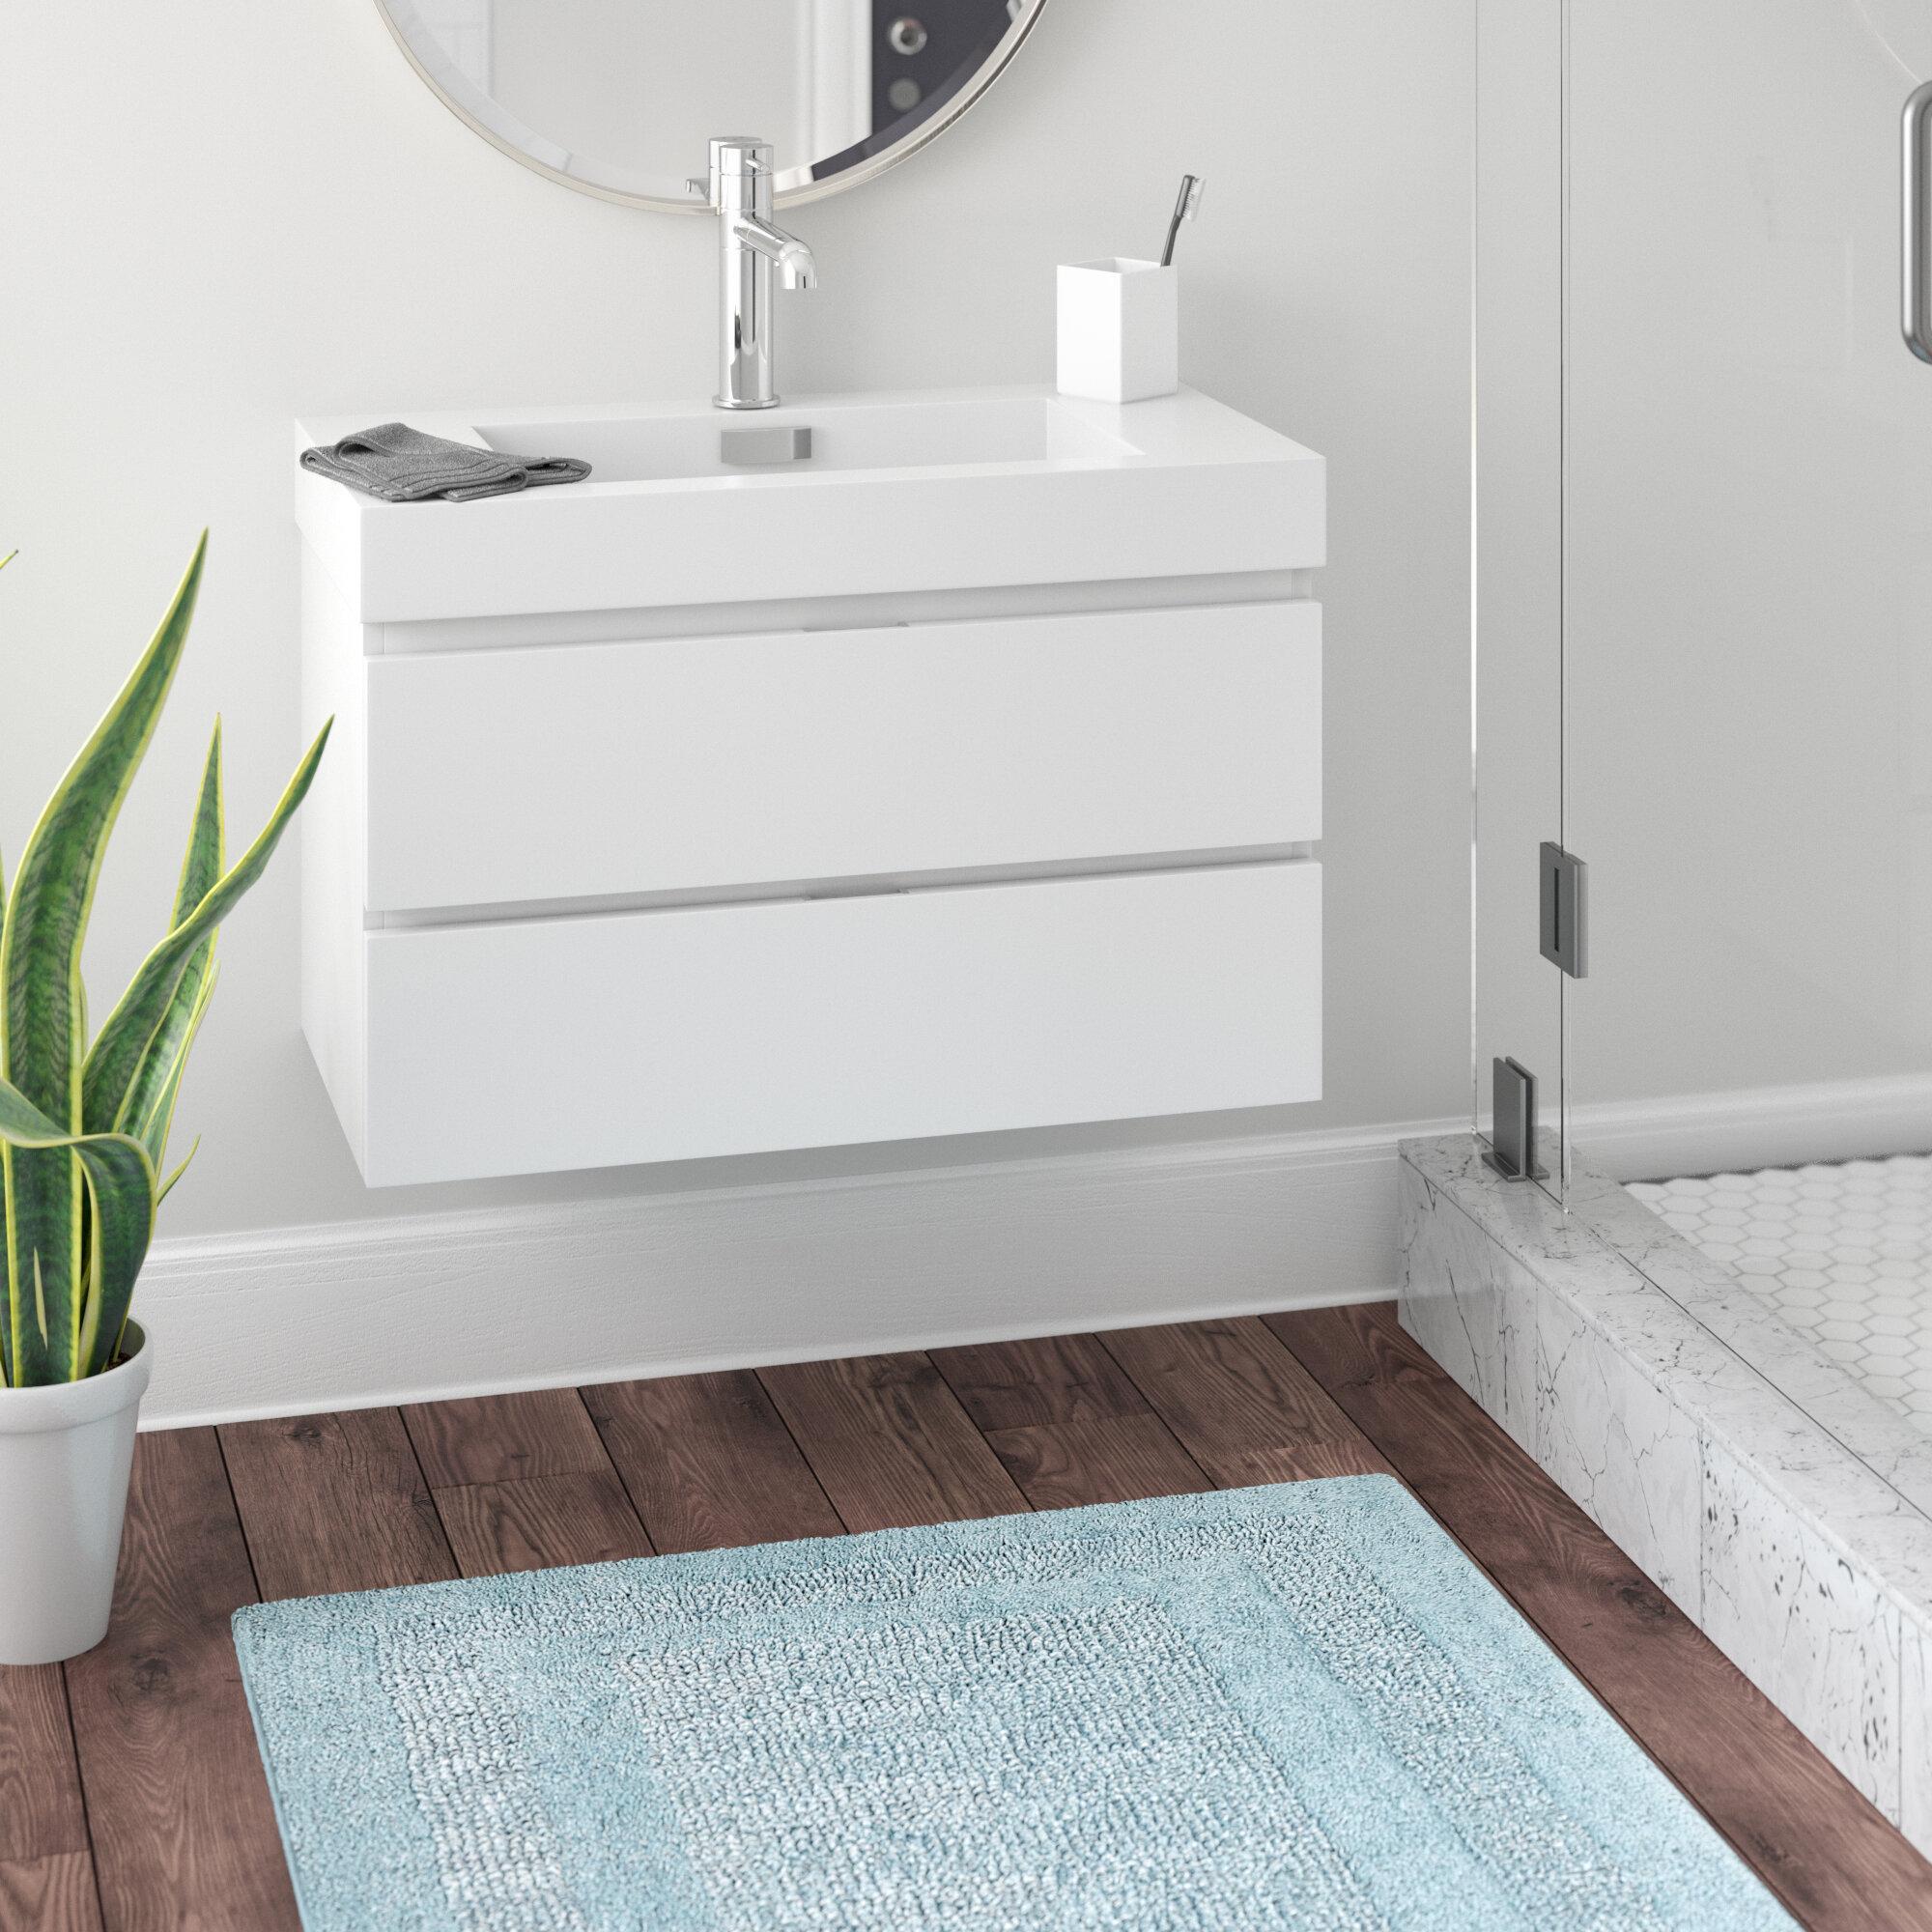 Wade Logan Tenafly 36 Wall Mounted Single Bathroom Vanity Set Reviews Wayfair